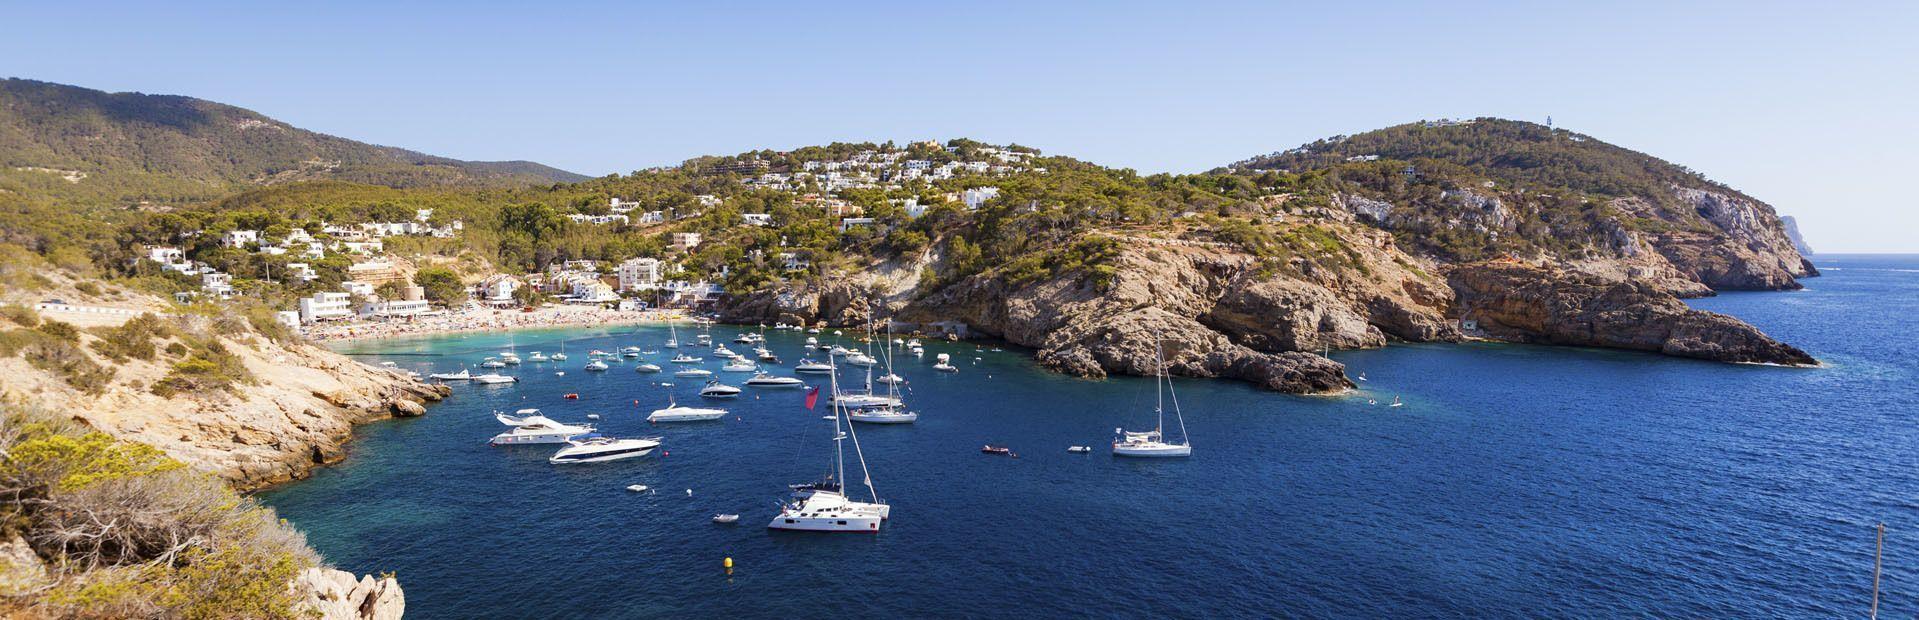 Isole Baleari: Ibiza e le spiagge di Formentera